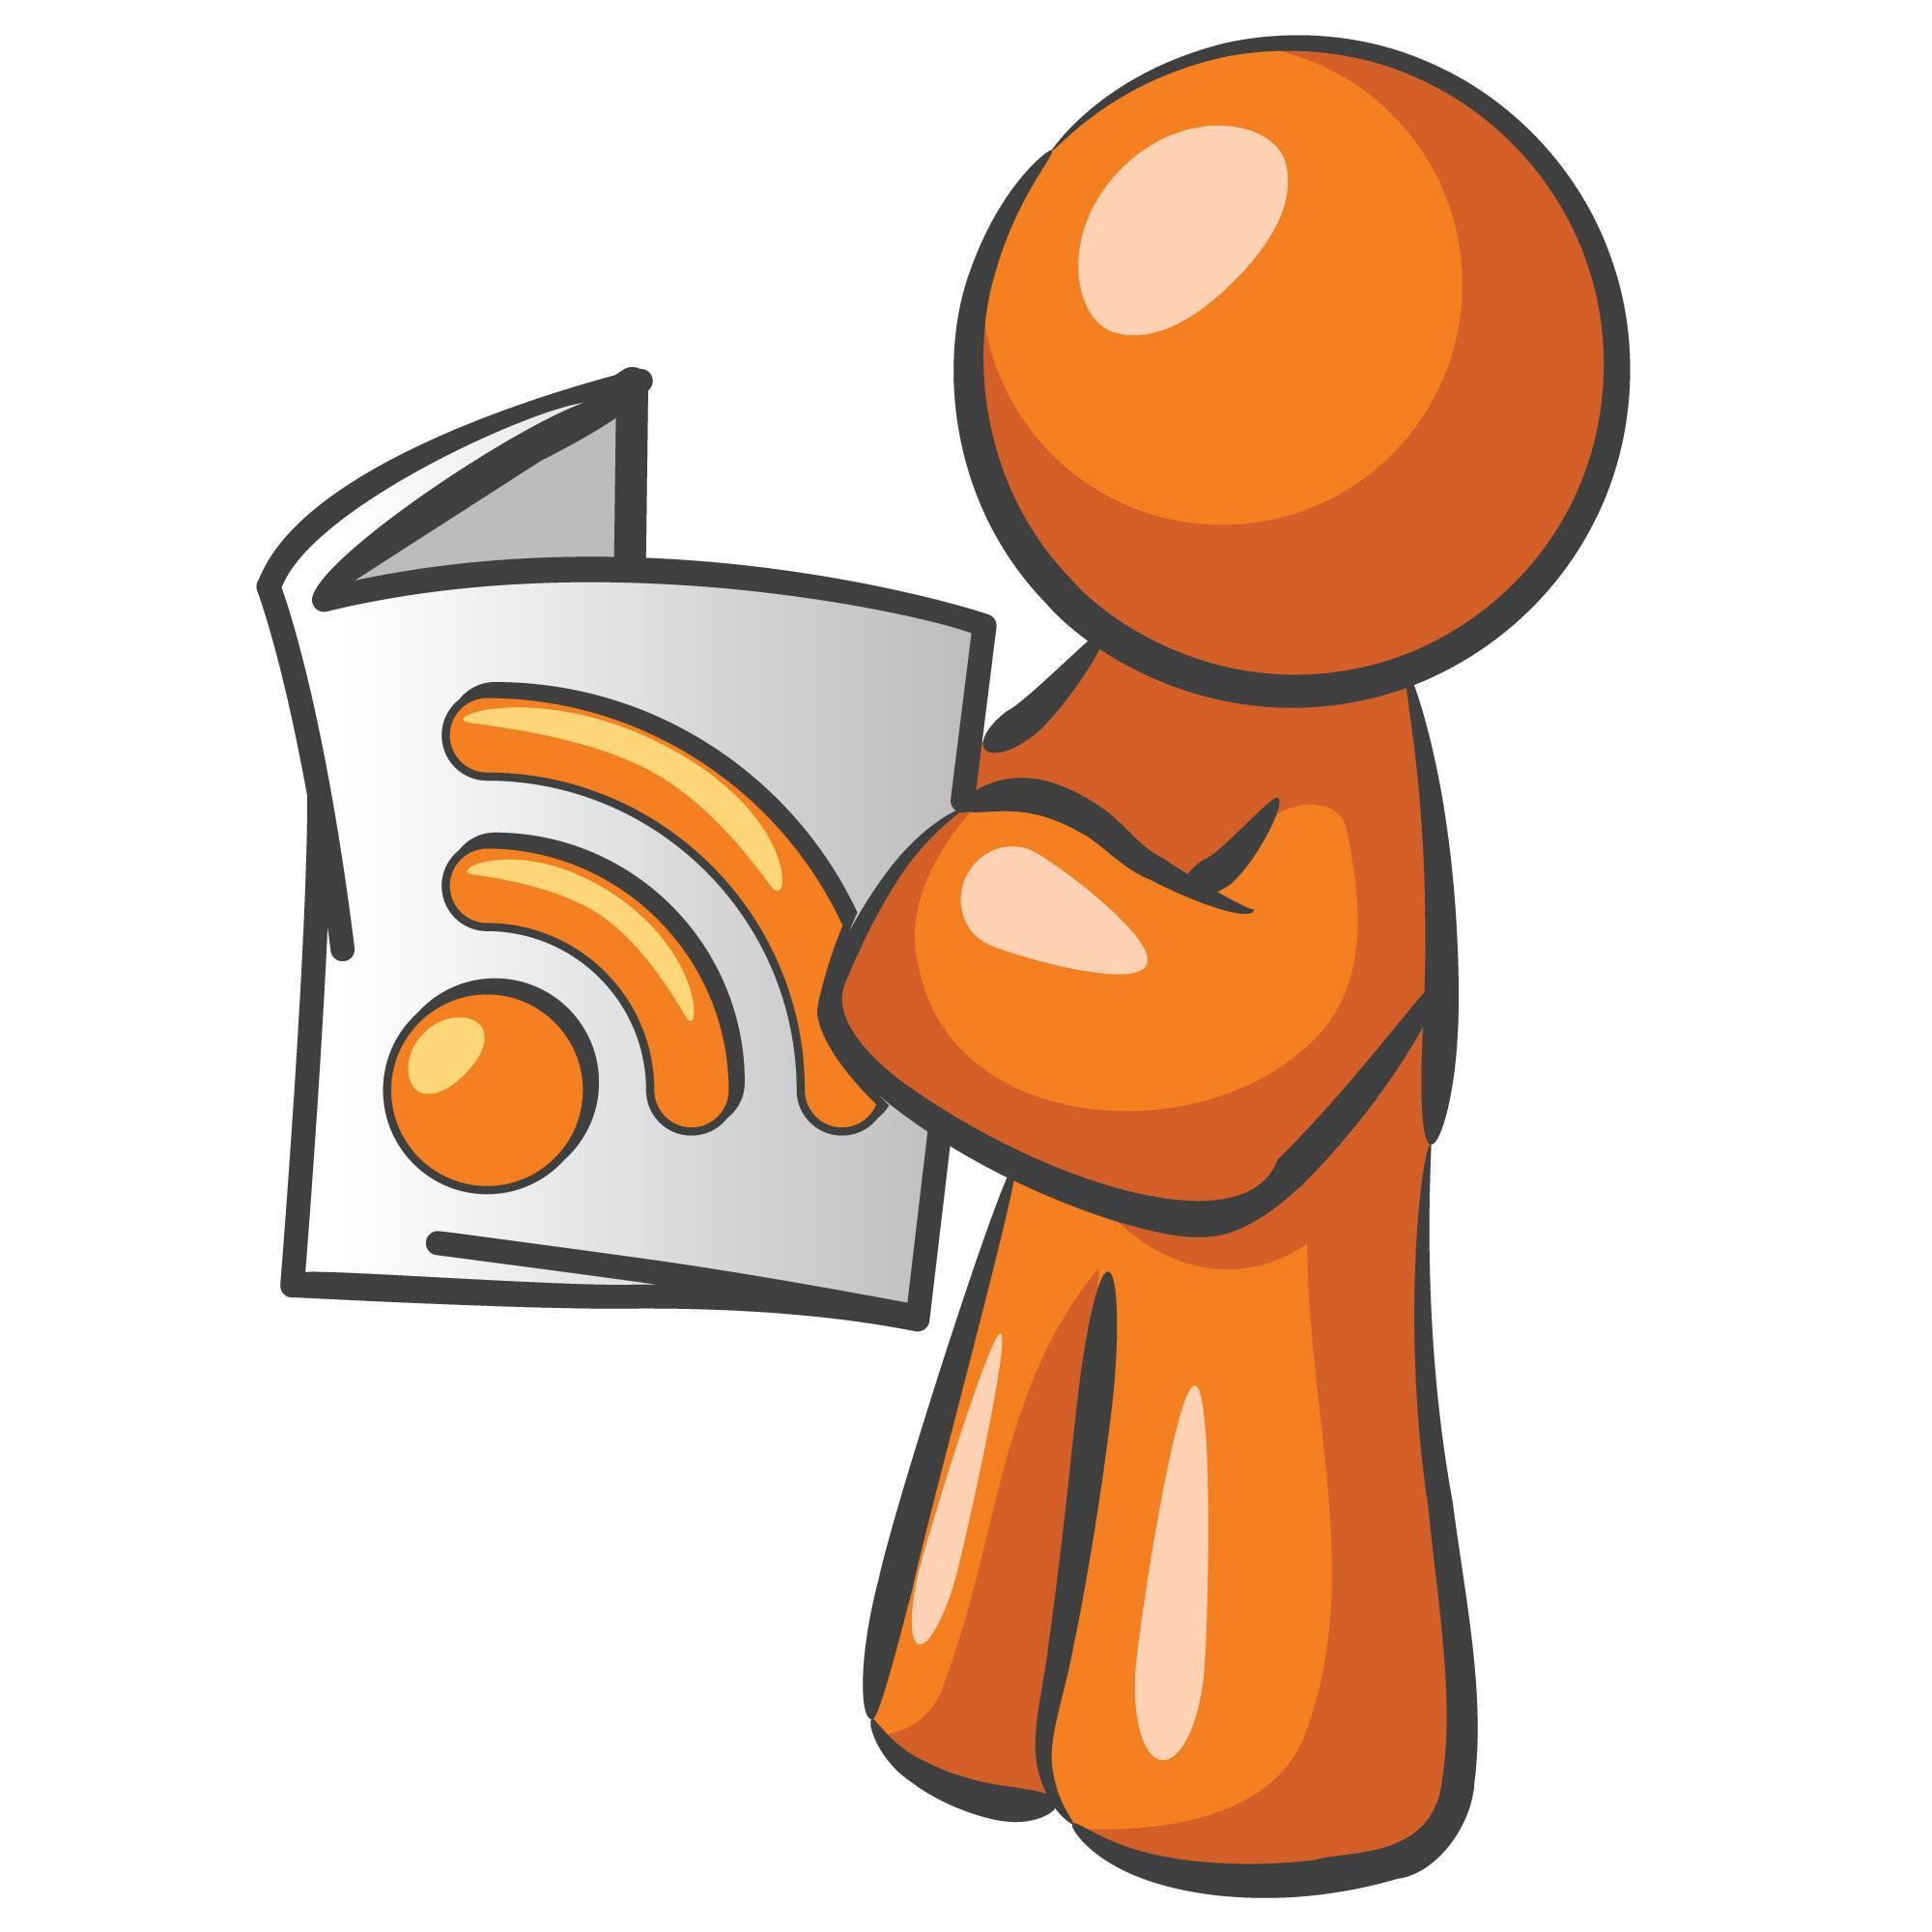 20140110080918_0555 مطلب ساز اتوماتیک جوملا obGrabber  - گلچین آنلاین